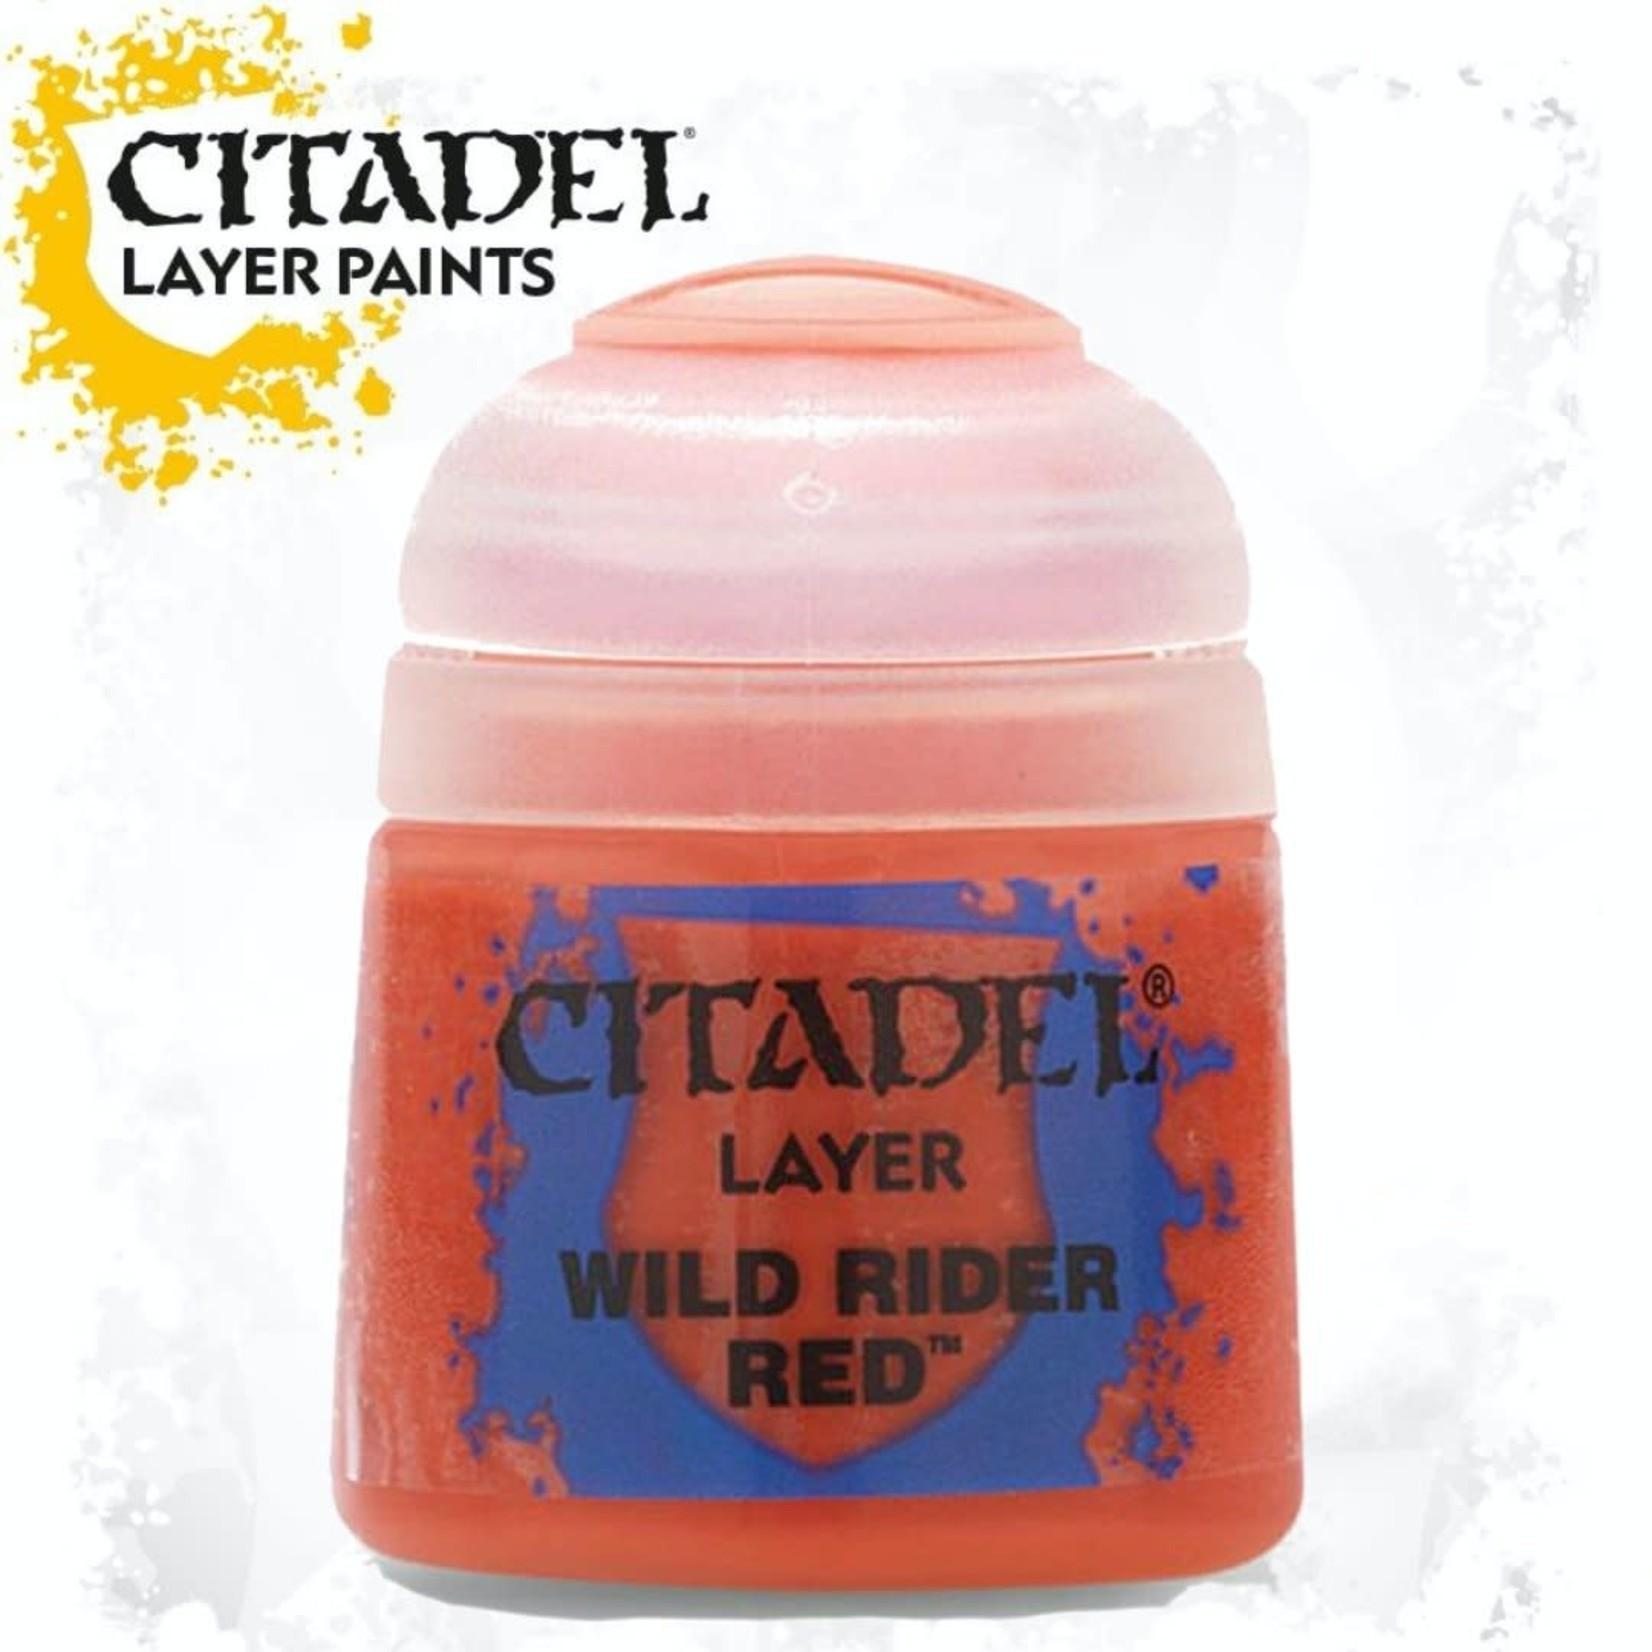 Citadel Citadel Paint - Layer: Wild Rider Red